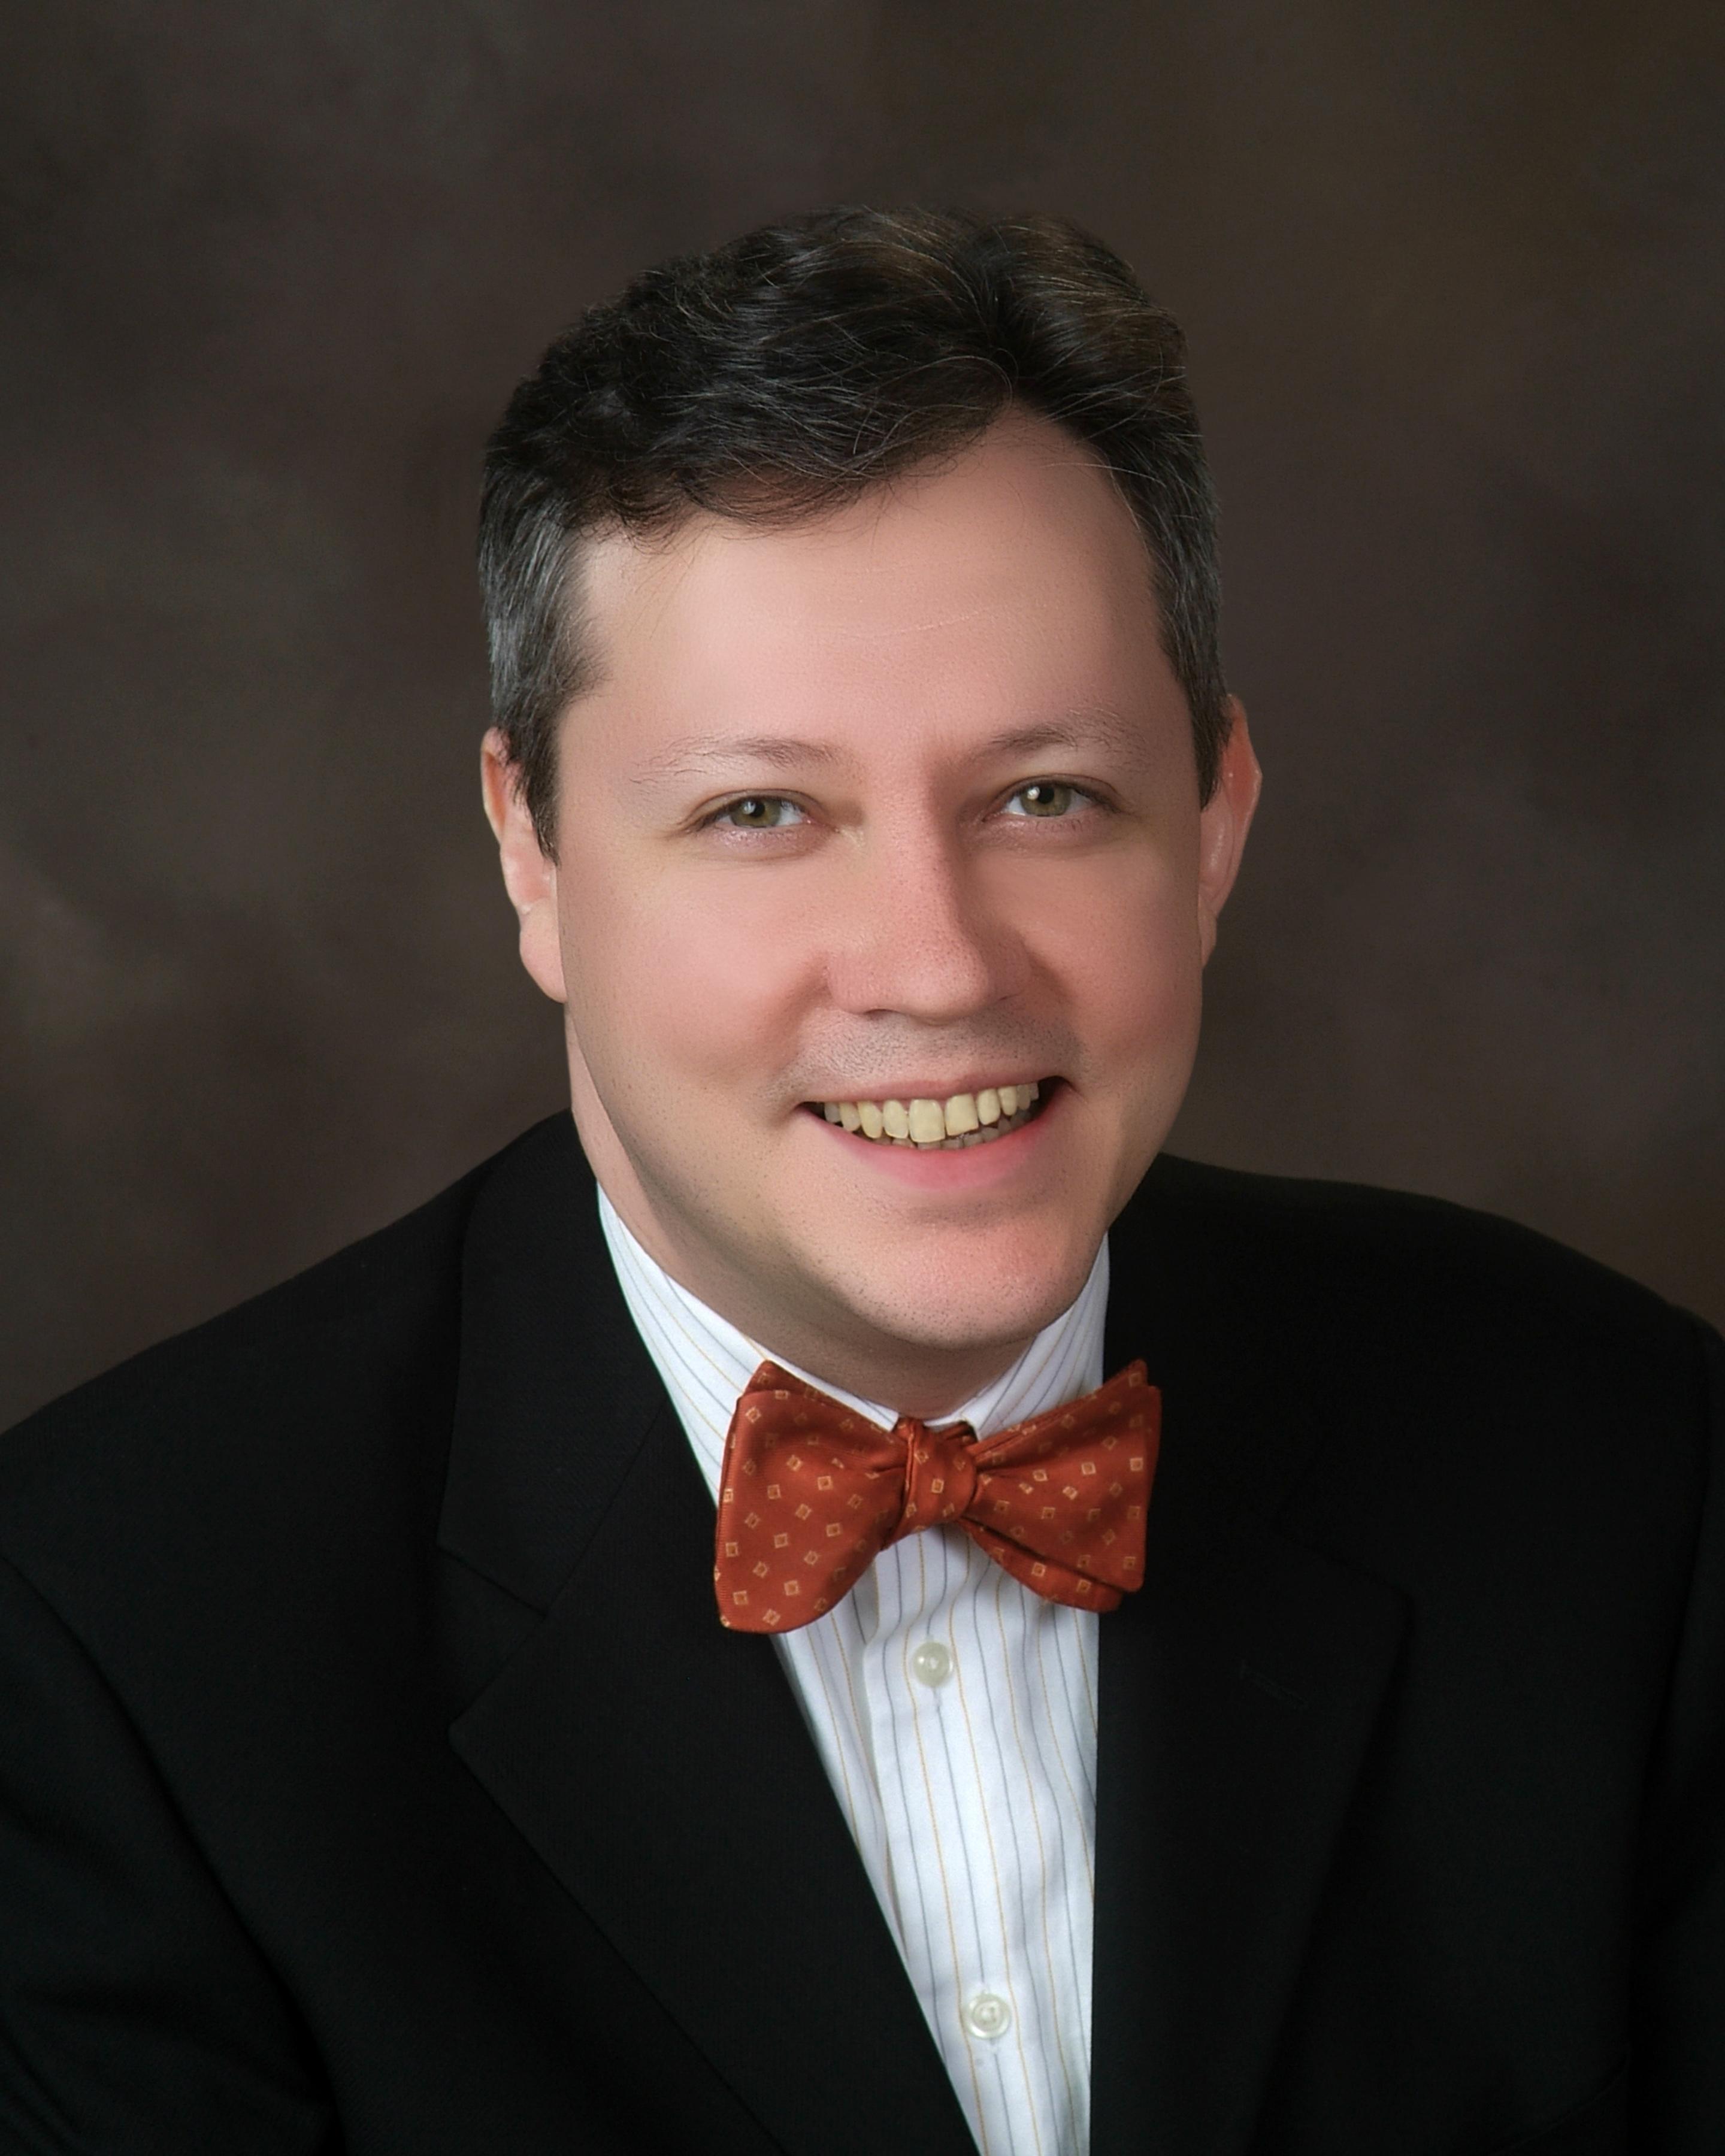 Mark Riggleman